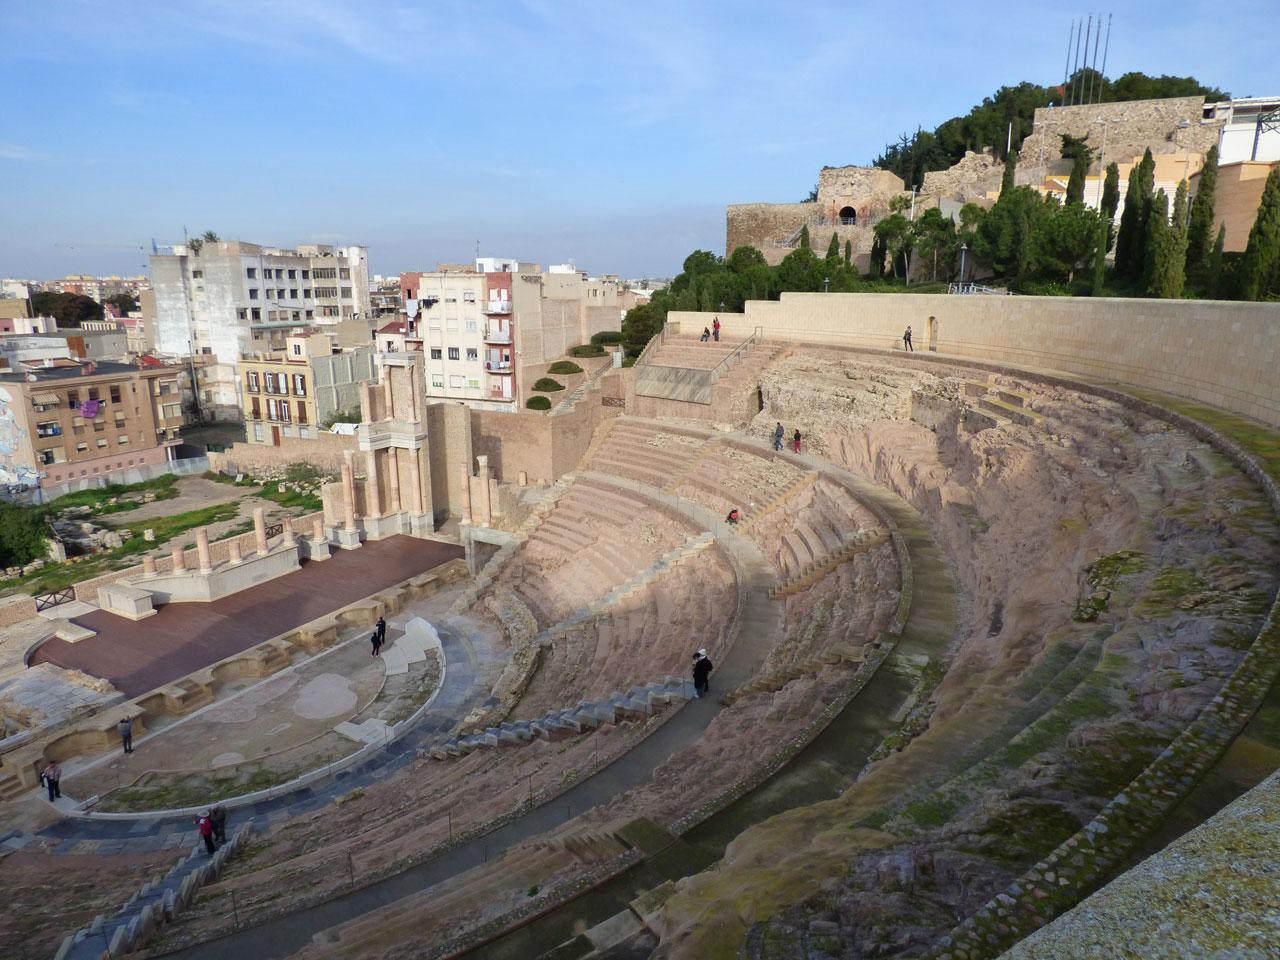 Roman Theatre, Cartagena, Spain